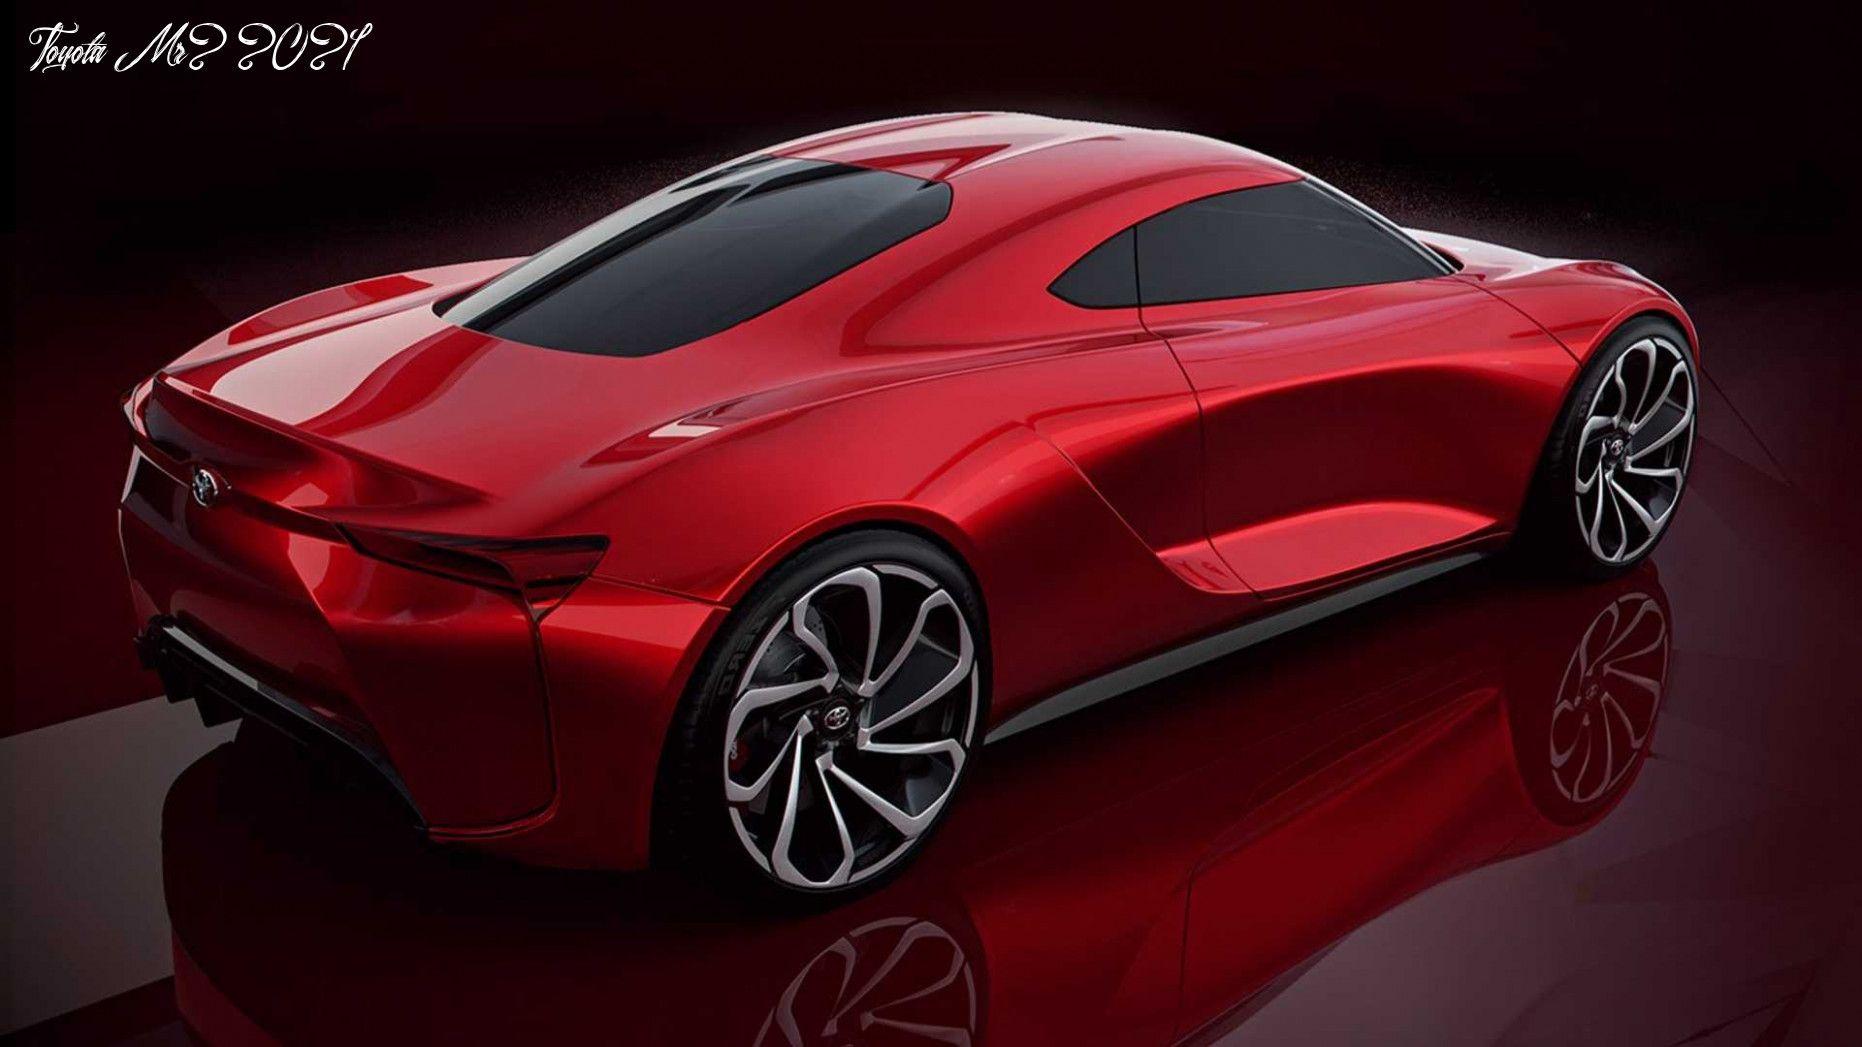 Toyota Mr2 2021 Price In 2020 Toyota Mr2 Toyota Concept Car Design